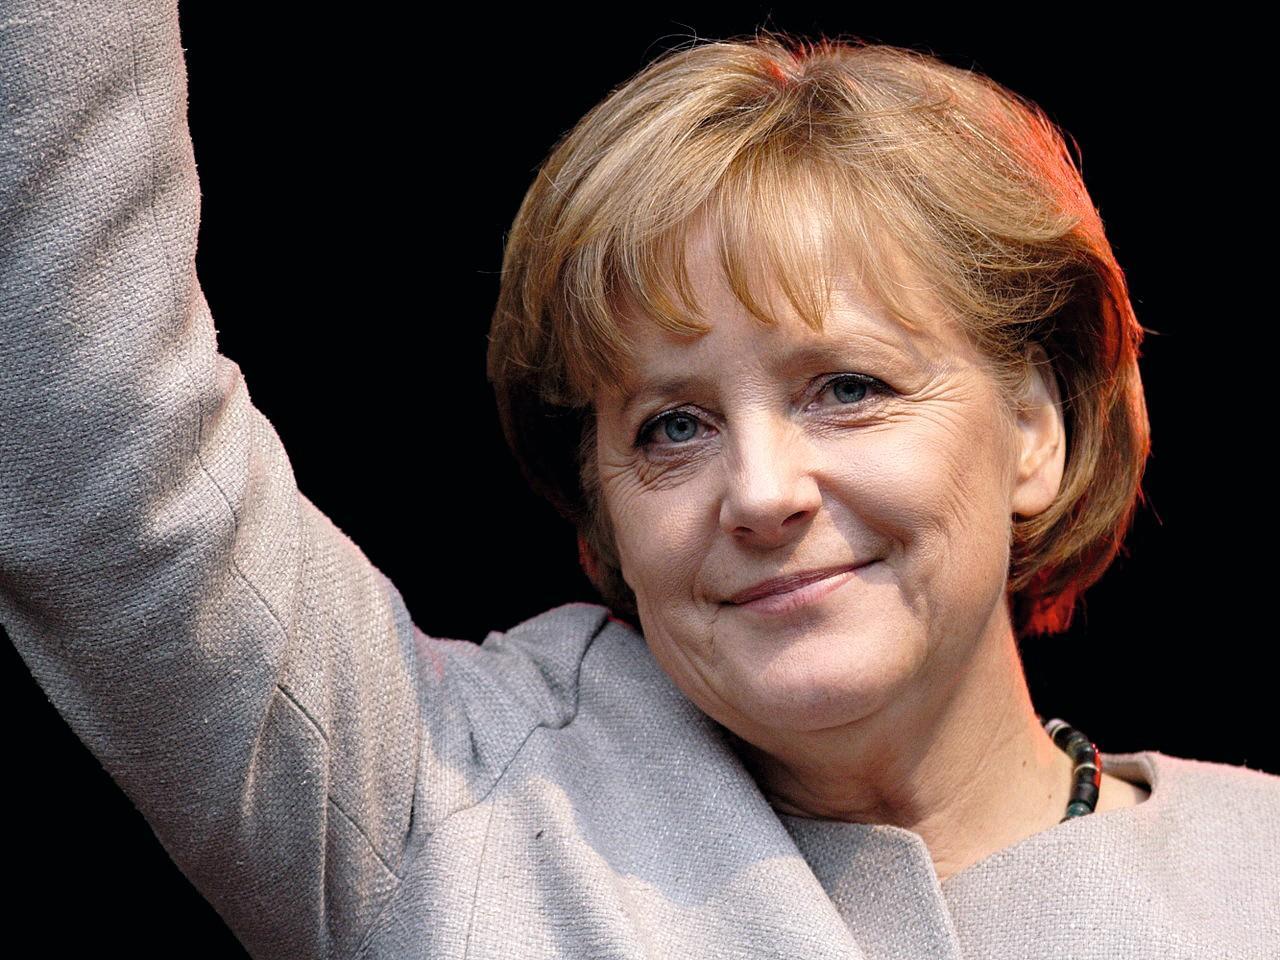 Angela Merkel (1954)